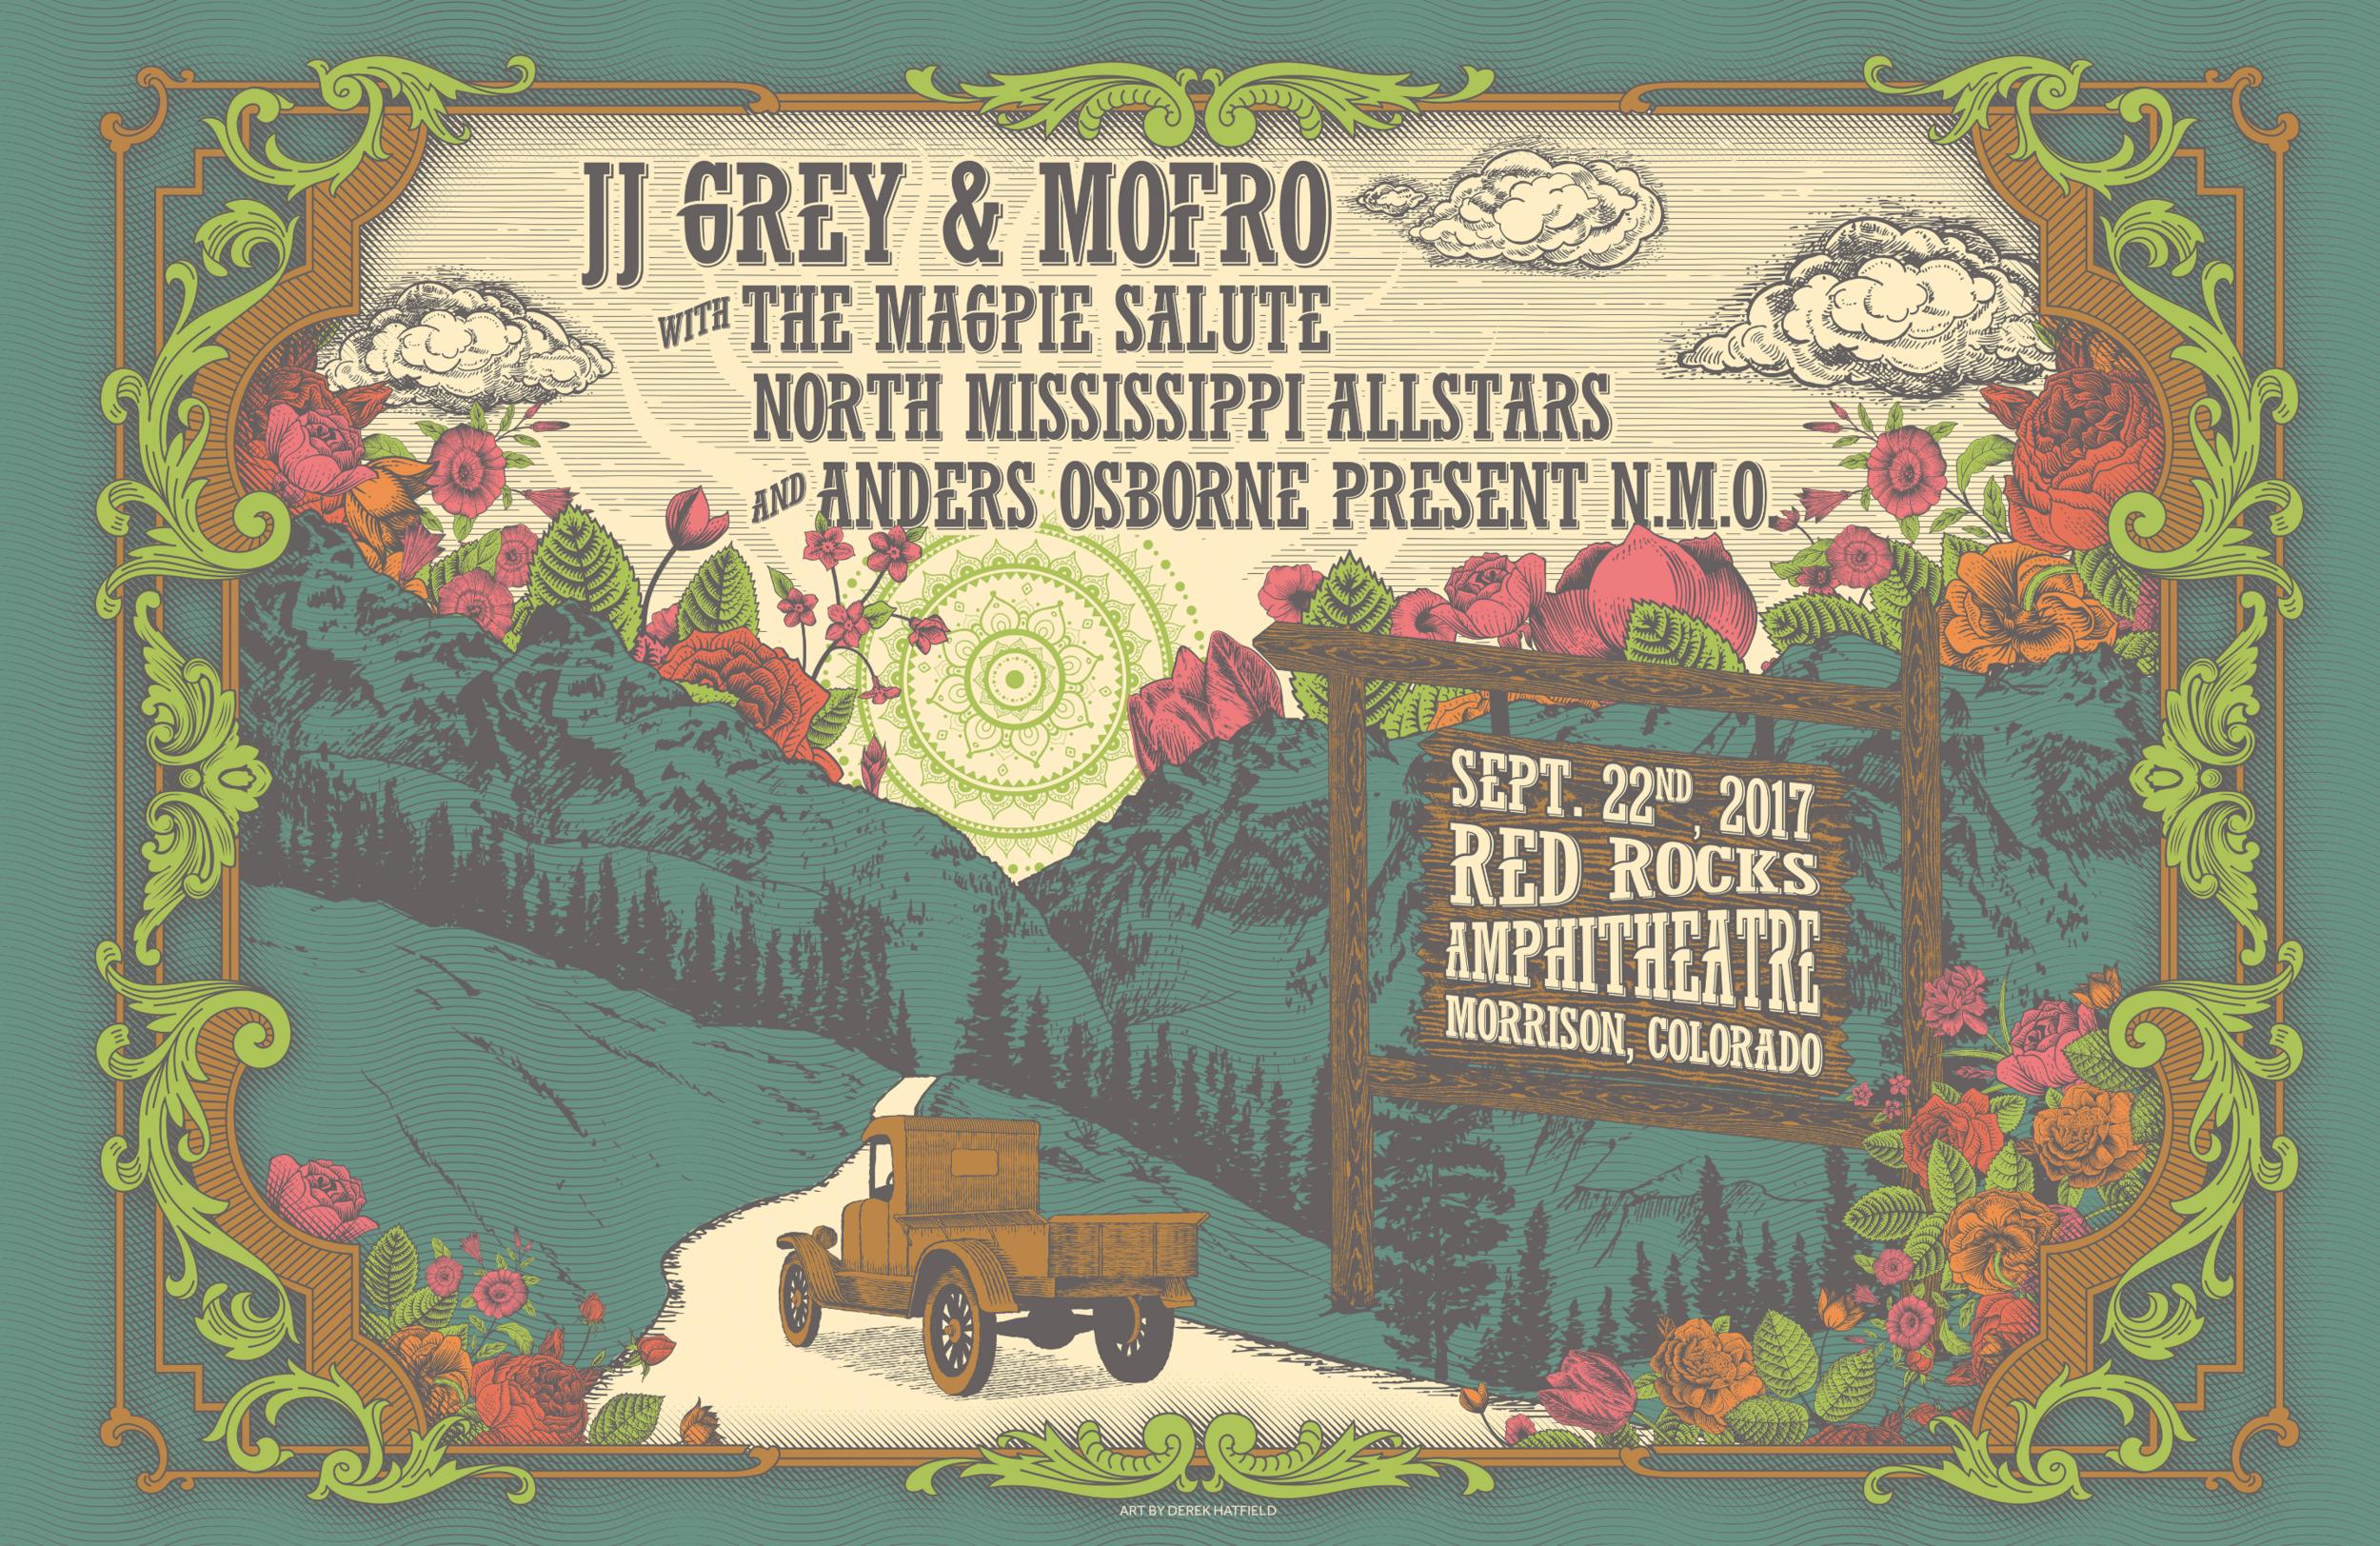 JJ Grey & Mofro - 9.22.2017